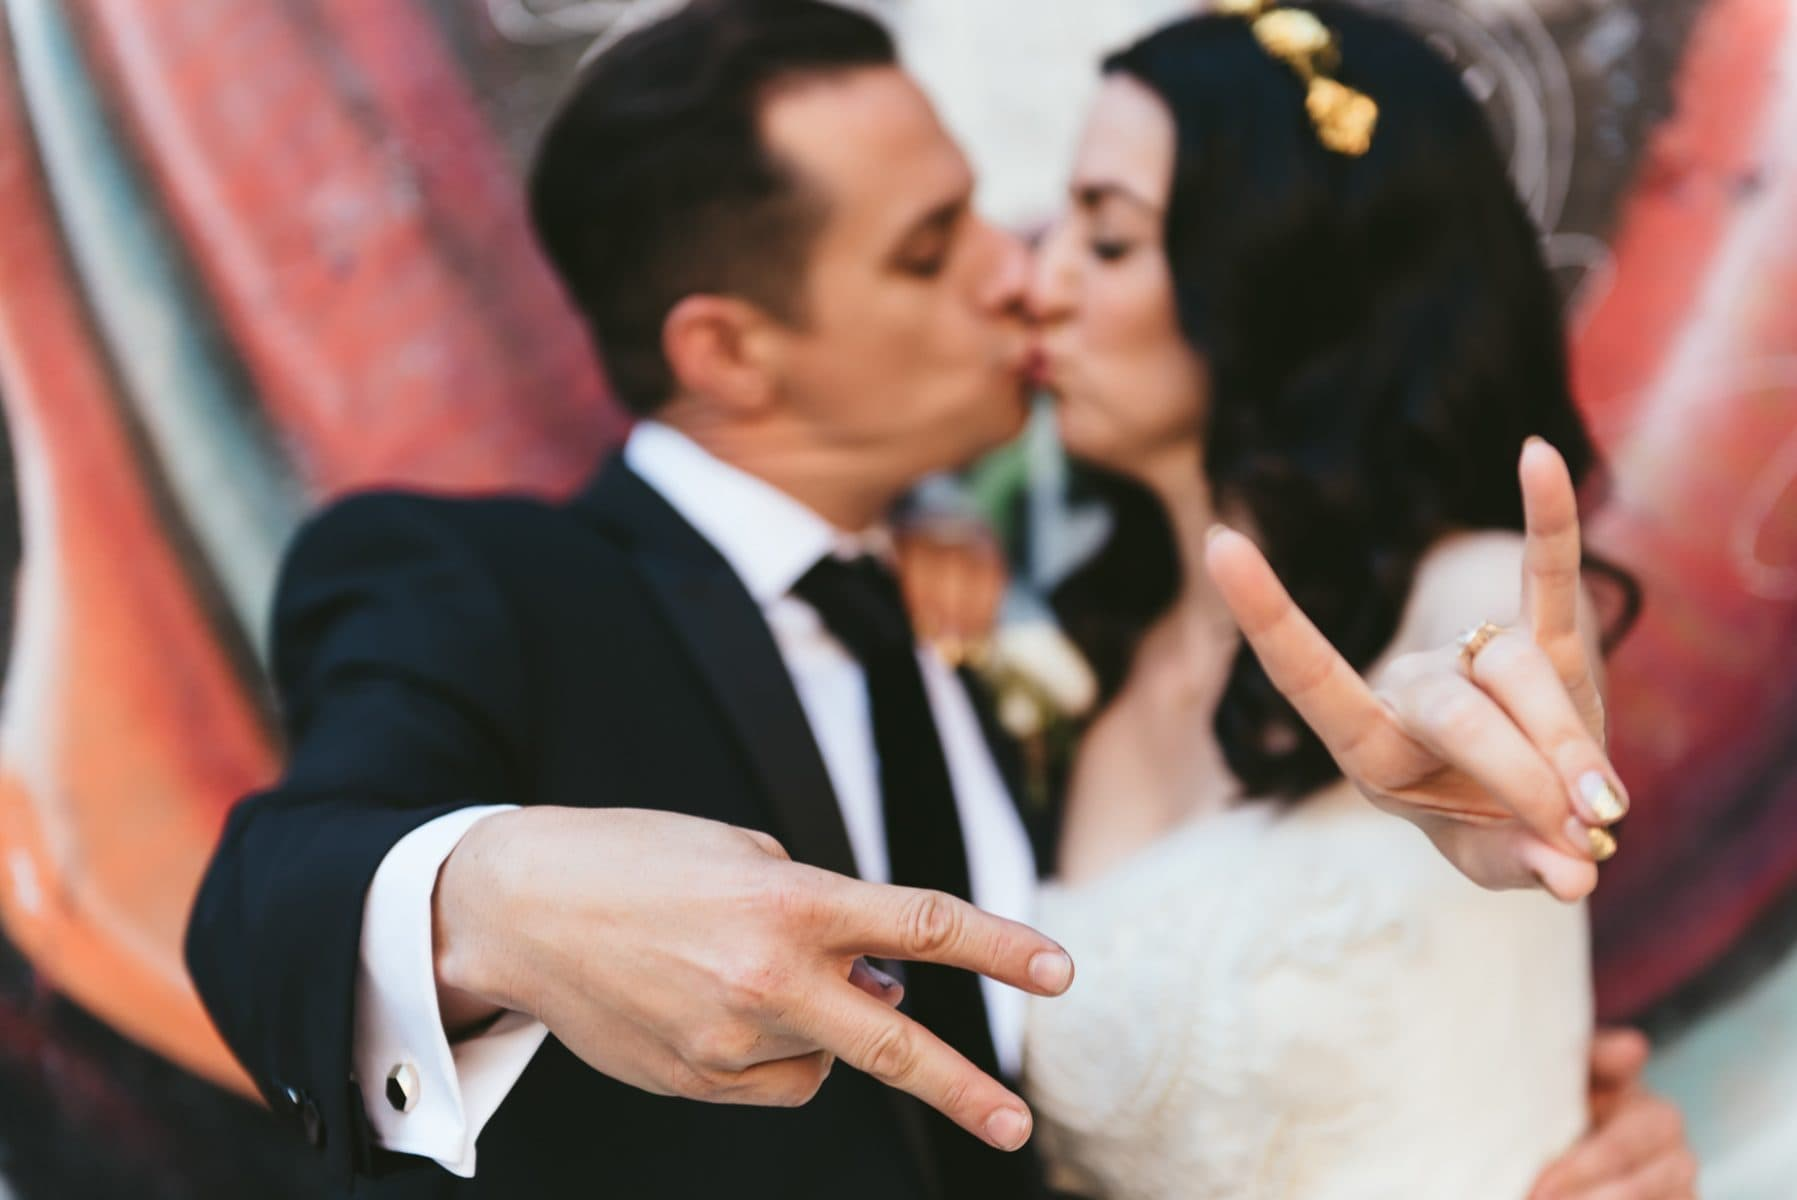 East village wedding photo